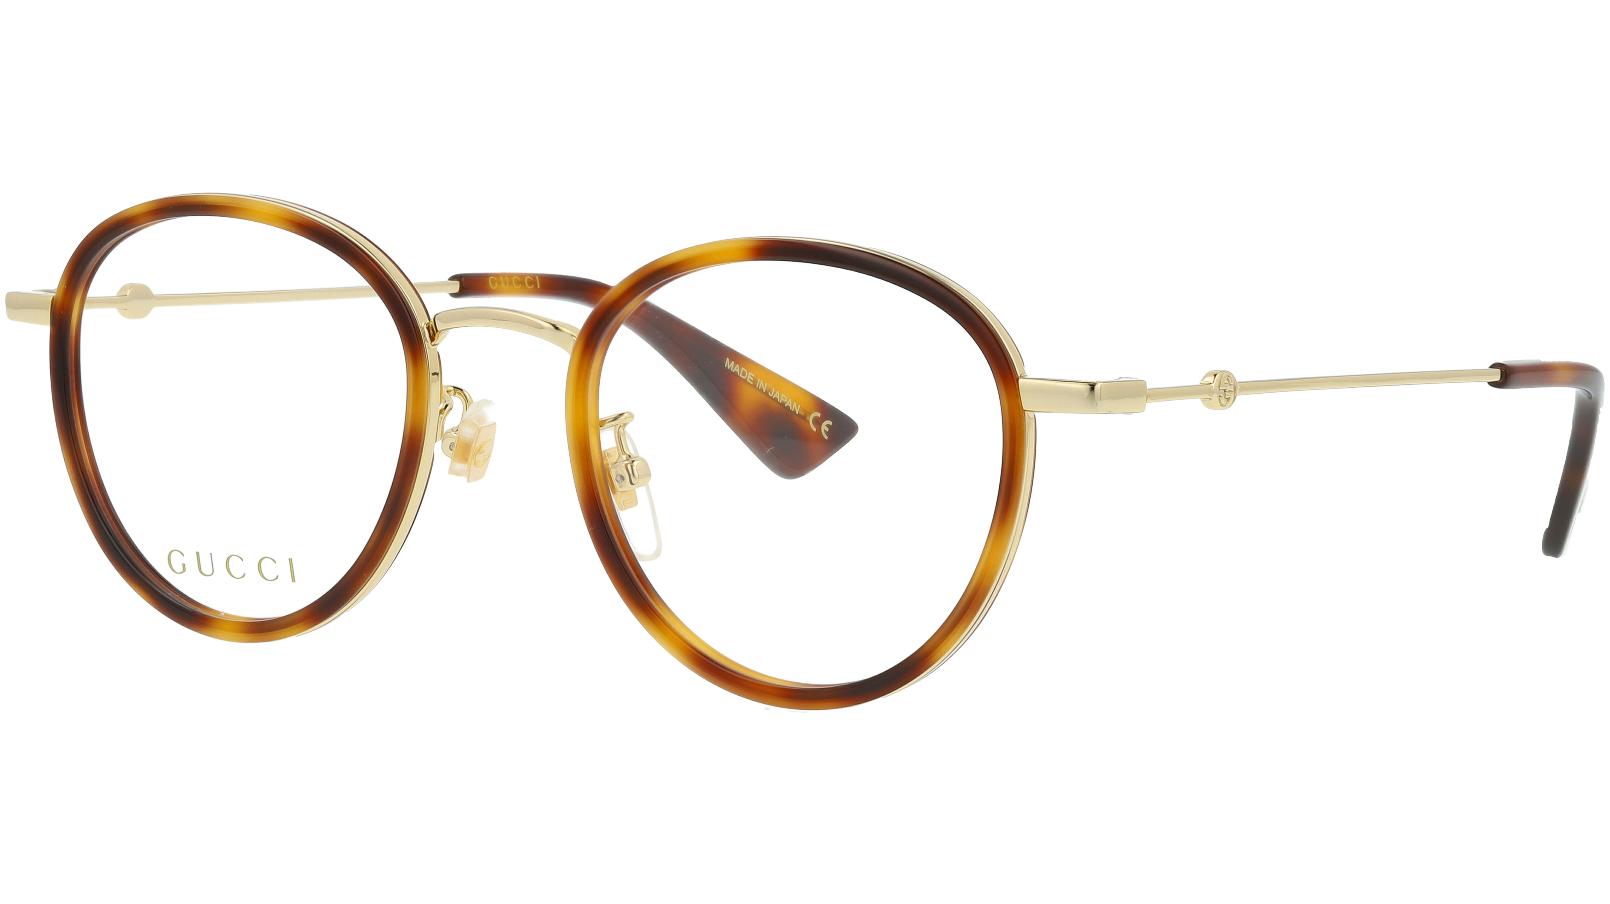 Gucci GG0608OK 004 49 Havana Round Glasses